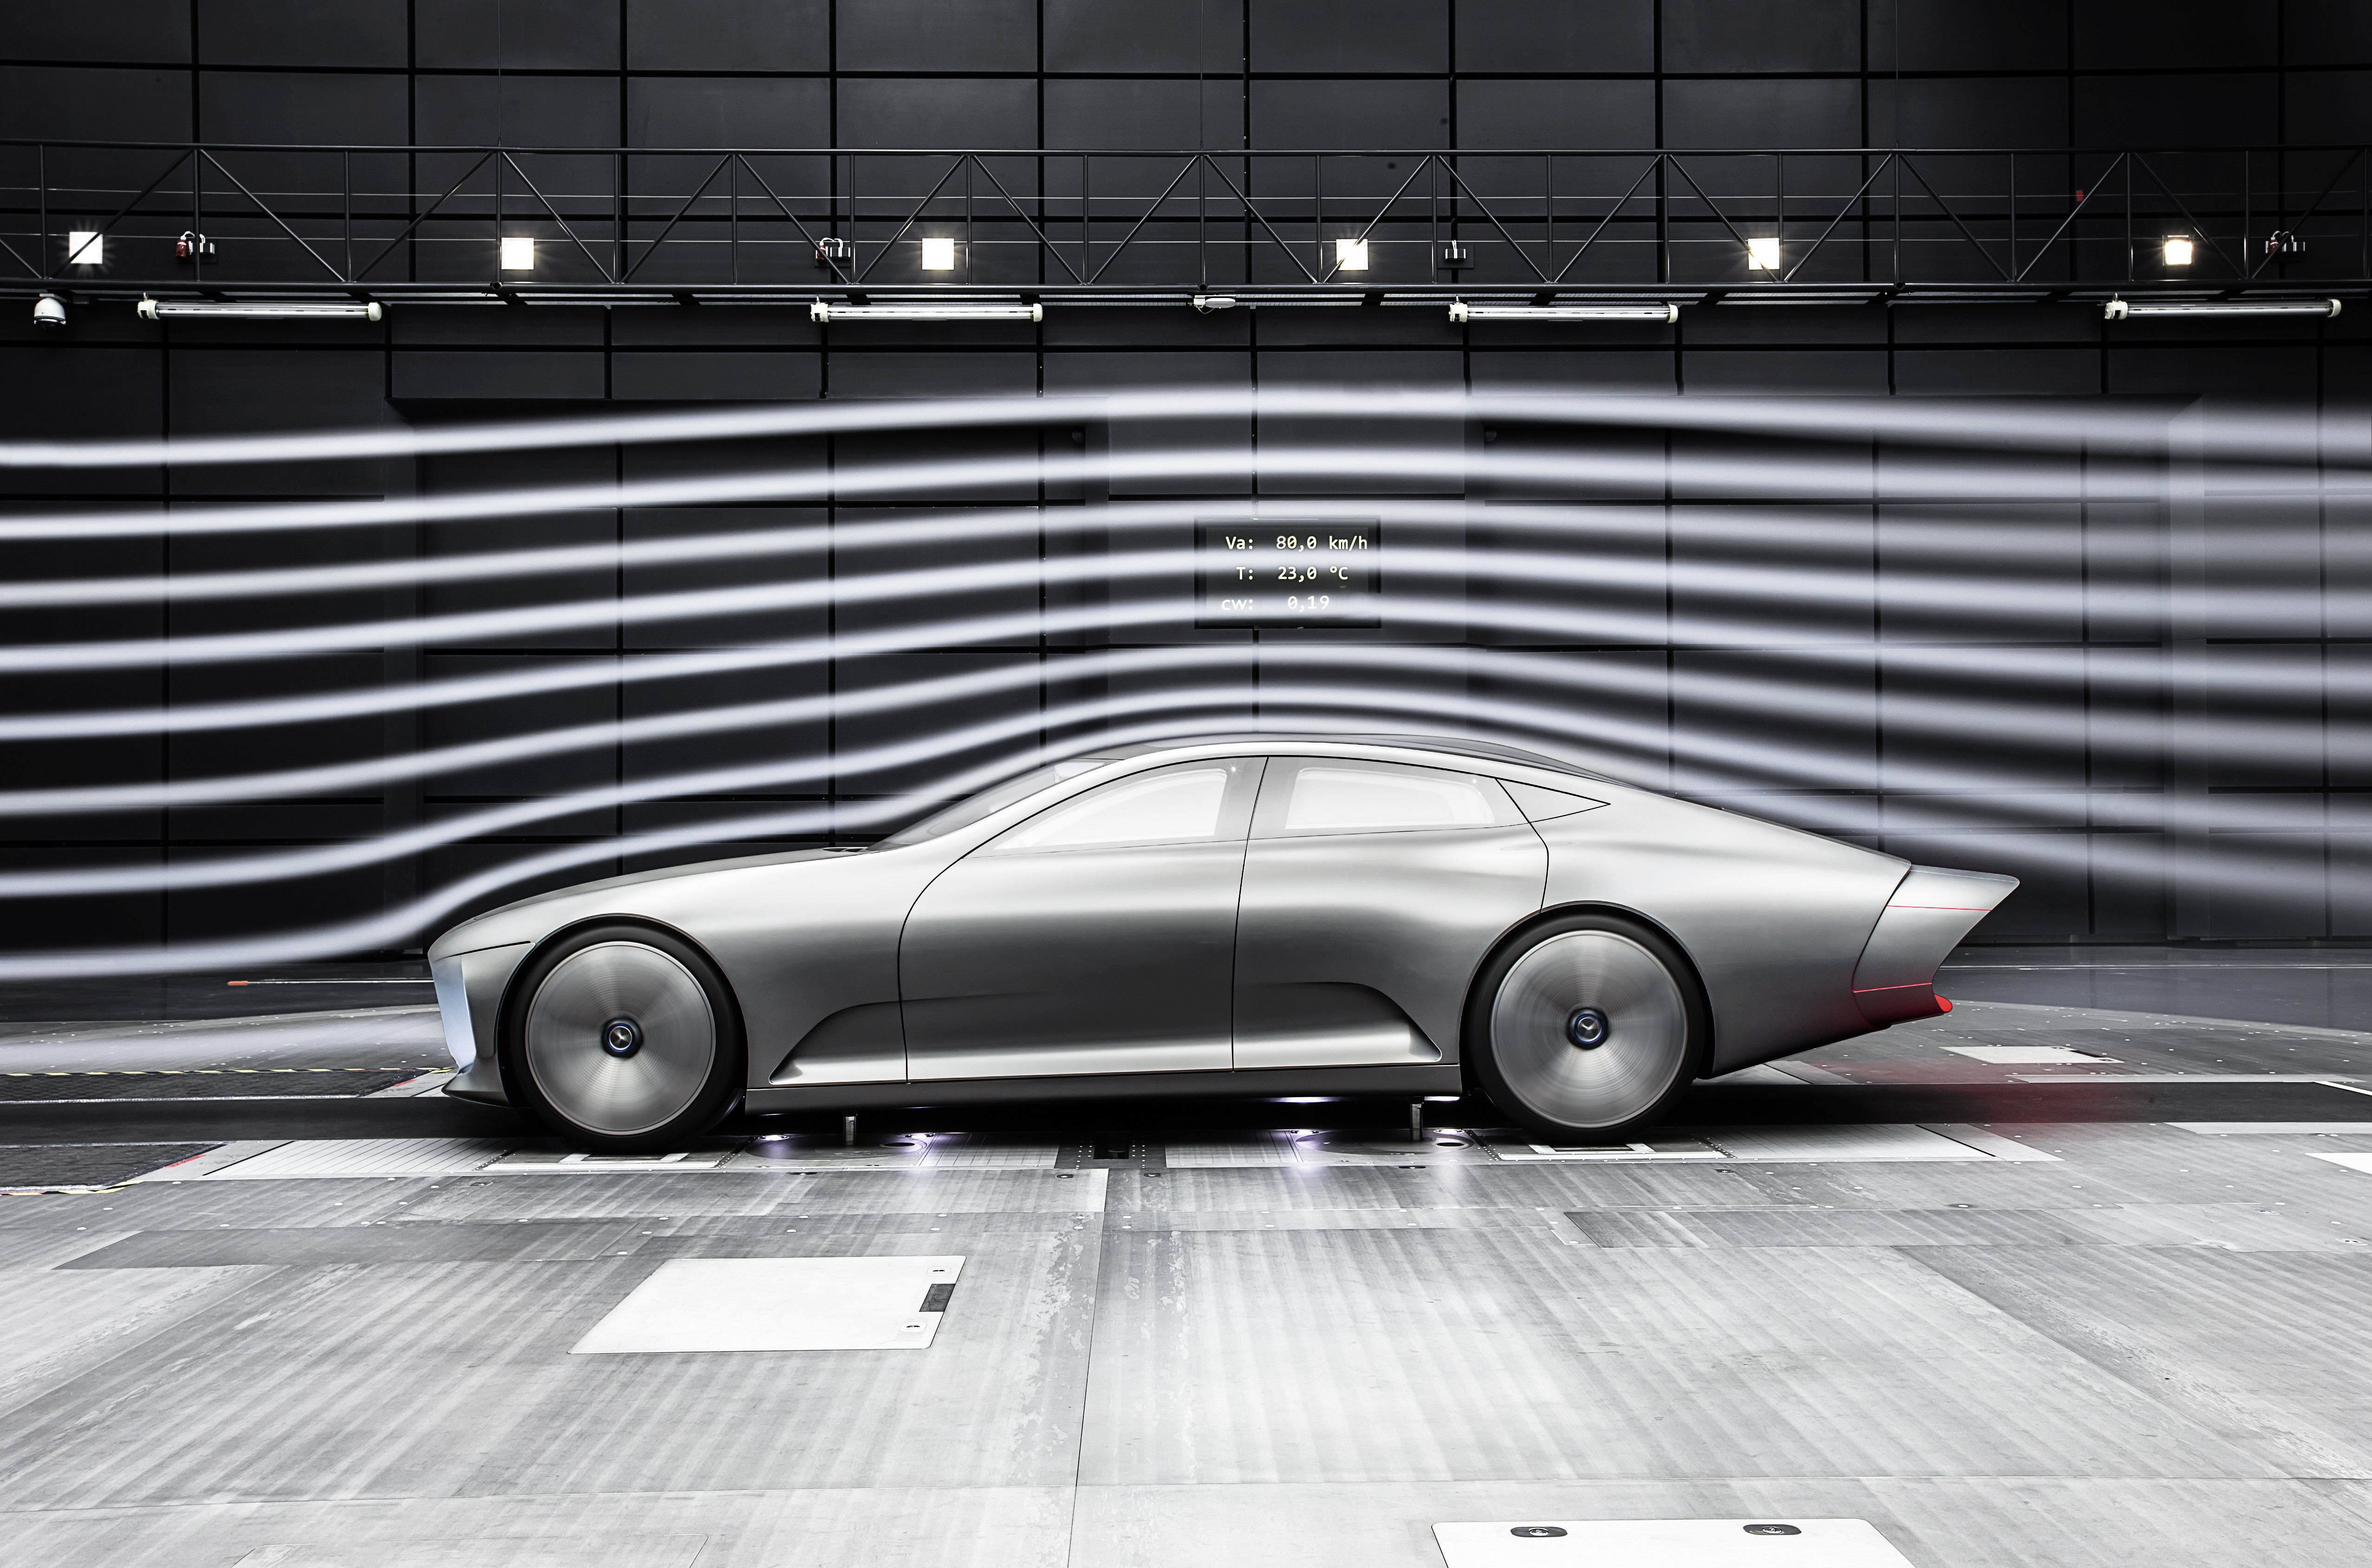 Acronym For Mercedes Benz